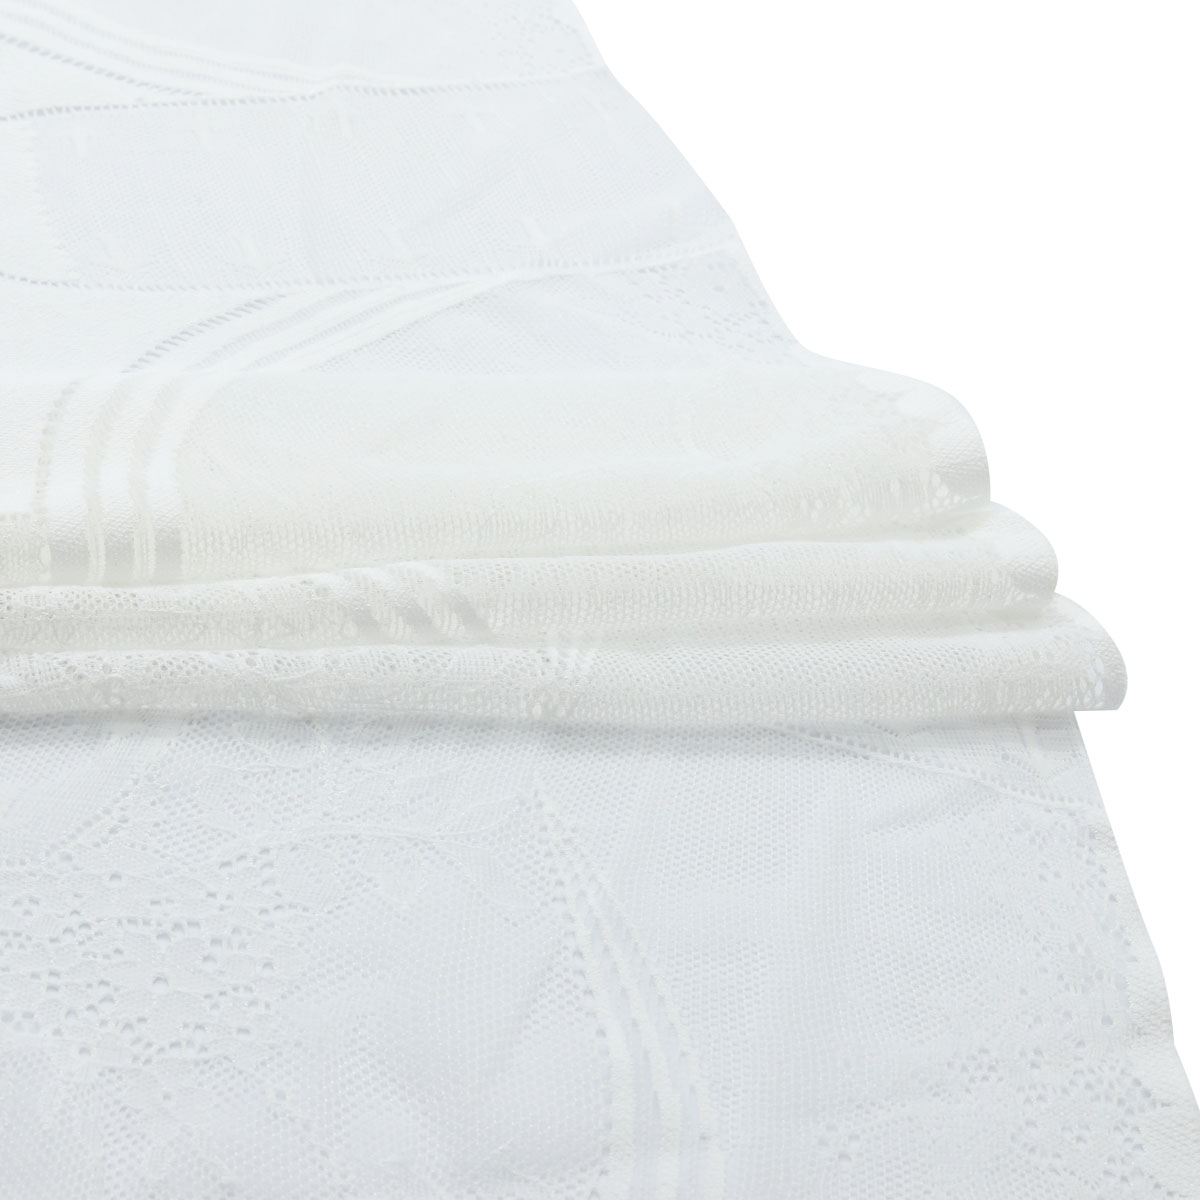 SU 150 Ткань эластичная бельевая 42,5 см*10